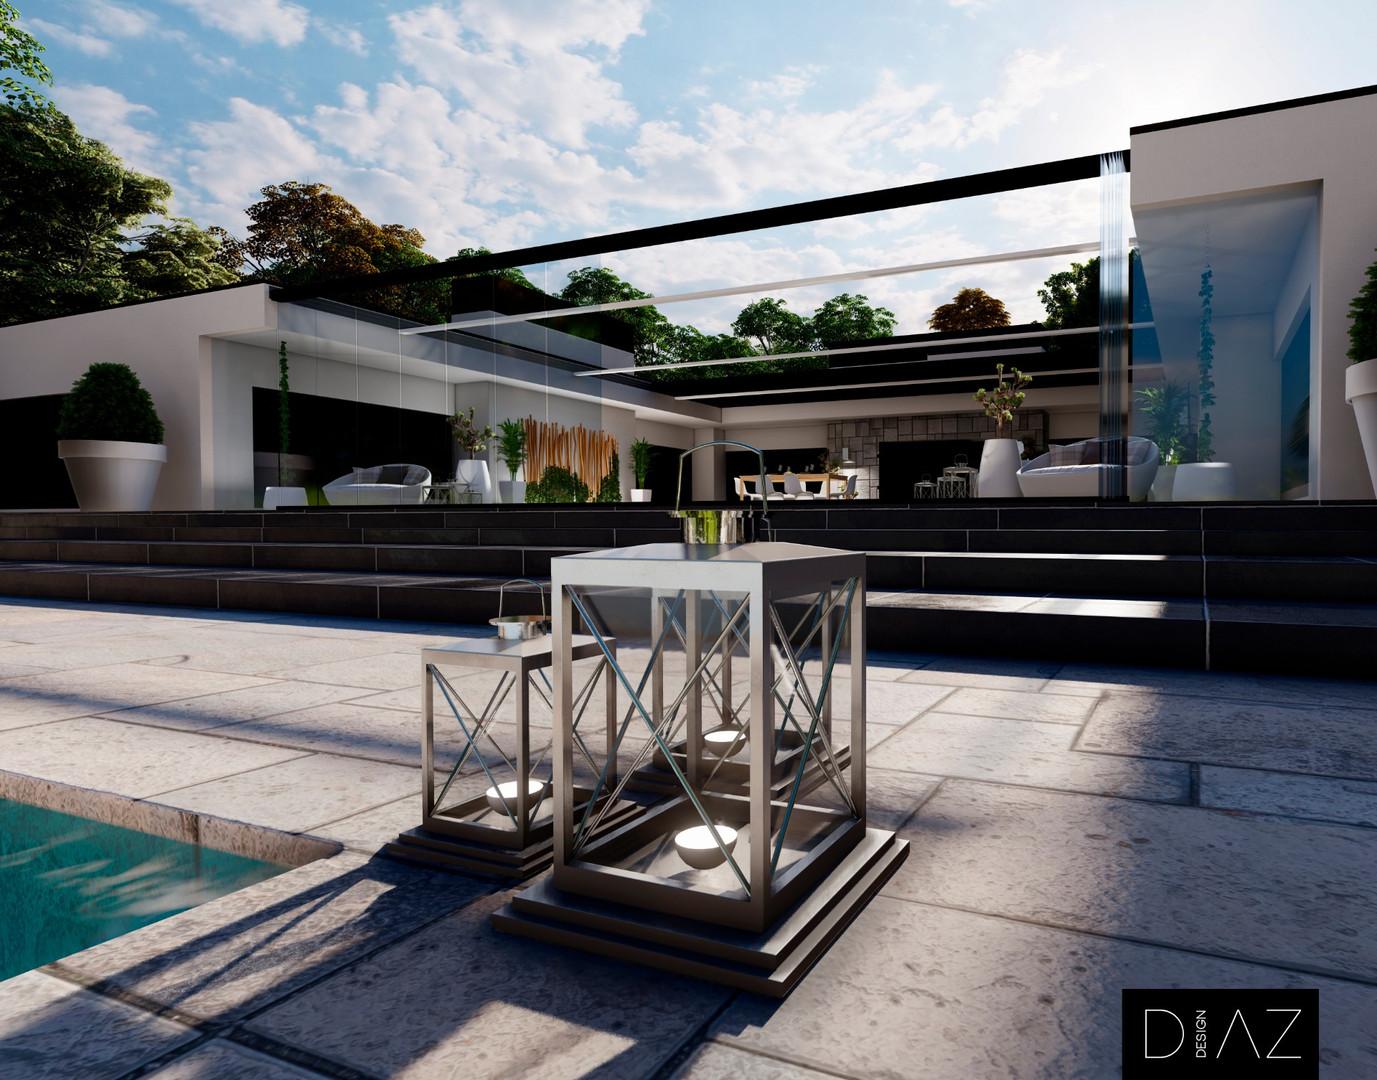 3D_Diazdesign3